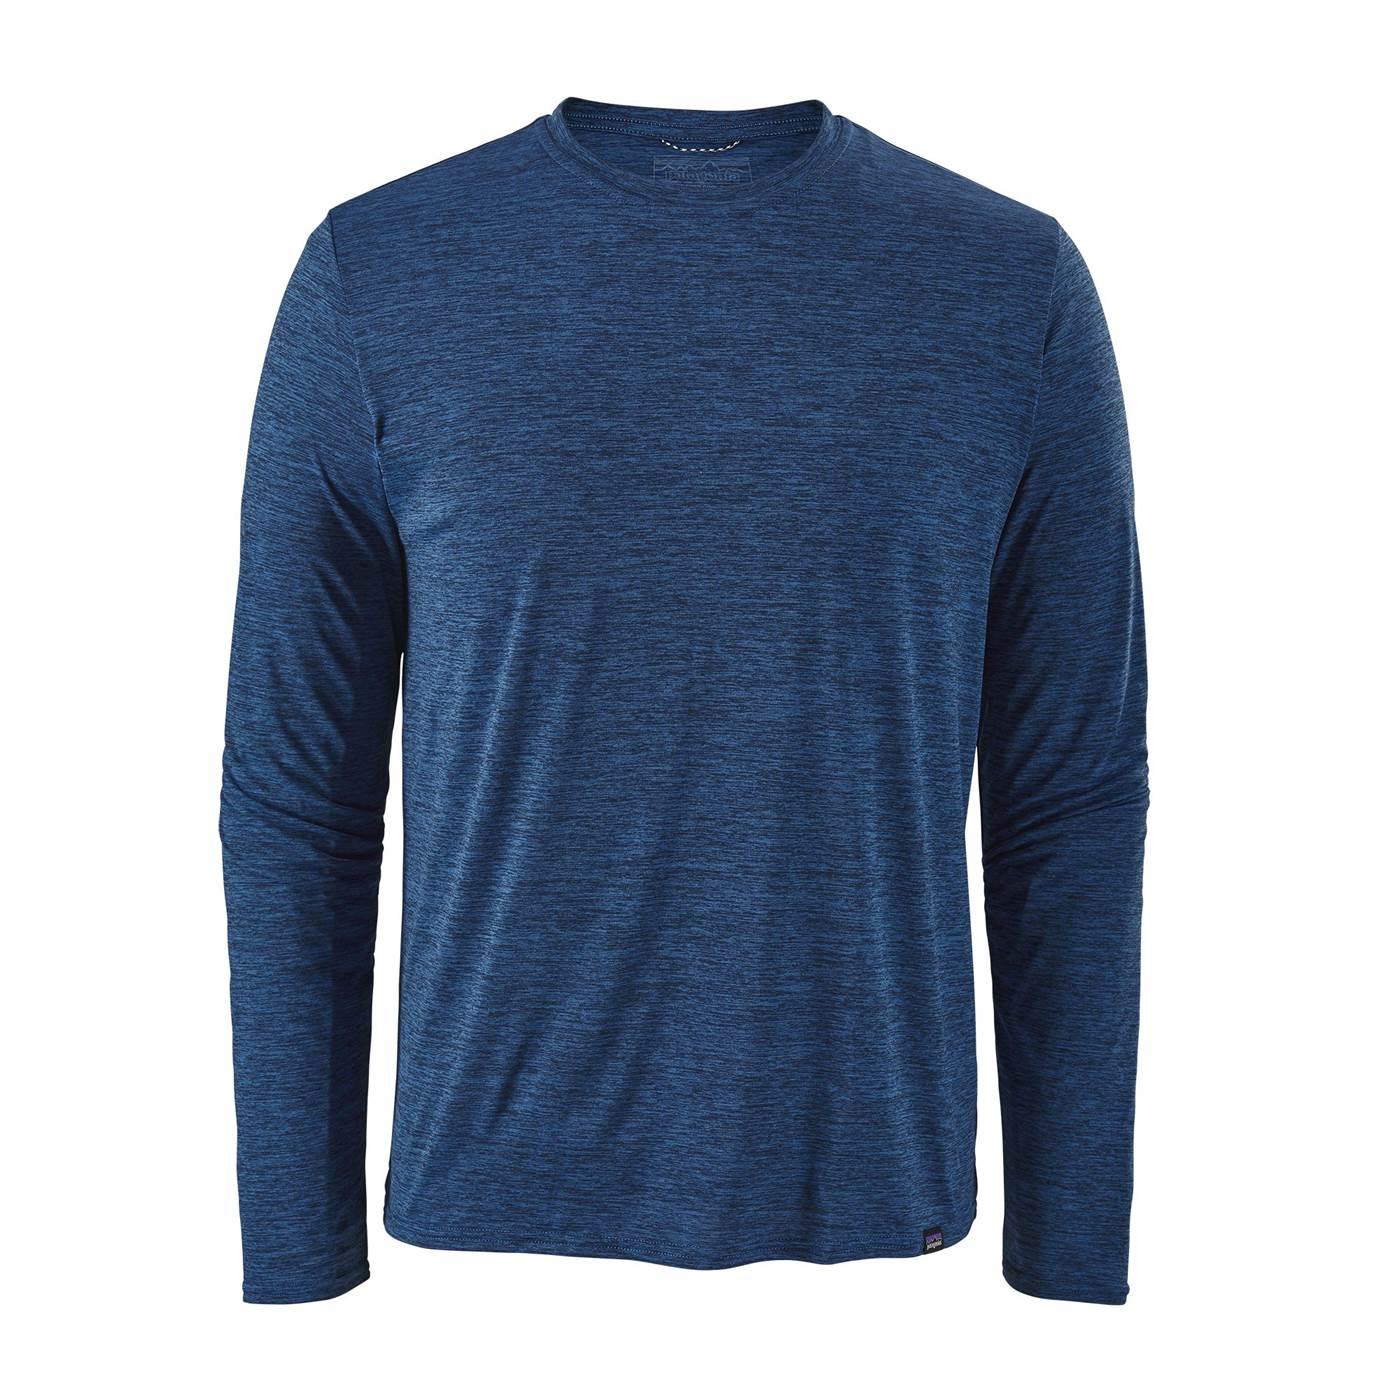 Cap Cool Daily Shirt Long Sleeve - Men's